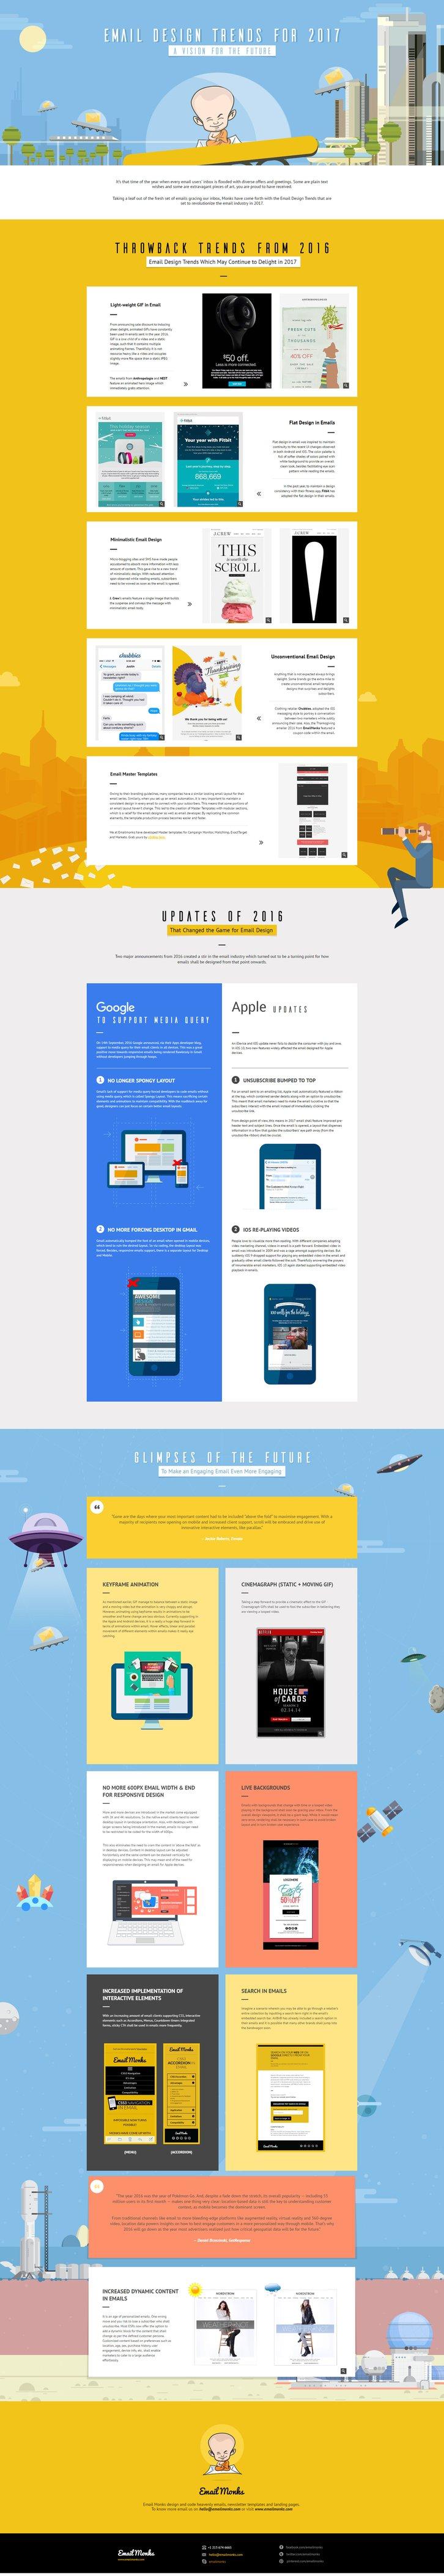 email-design-trends.jpg